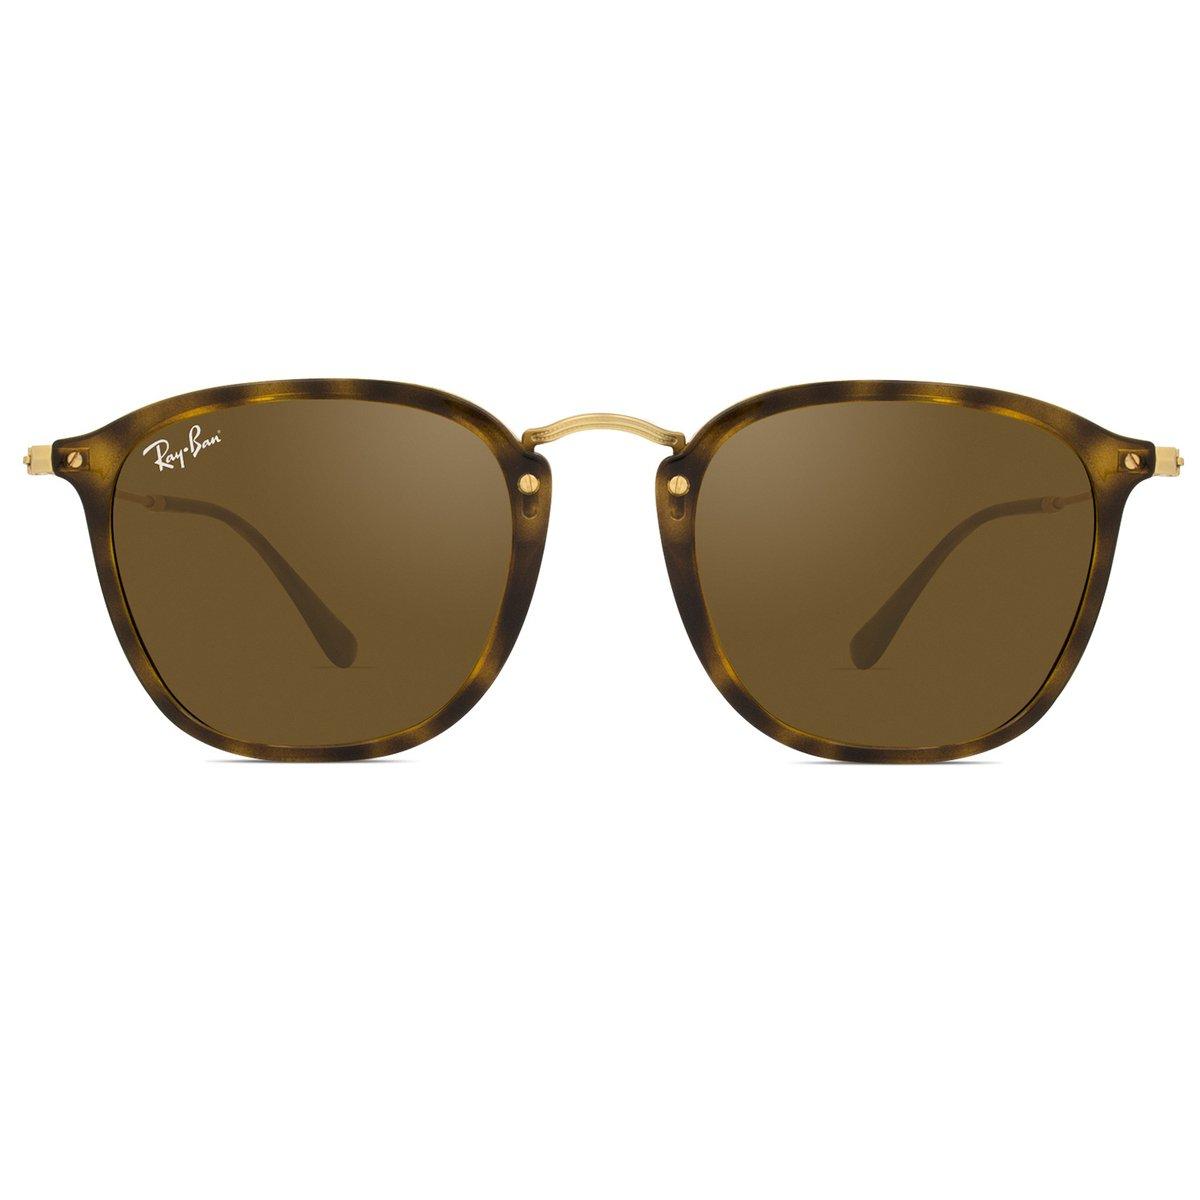 d4d512bd6 Óculos de Sol Ray Ban RB2448N 710-51 Feminino | Zattini